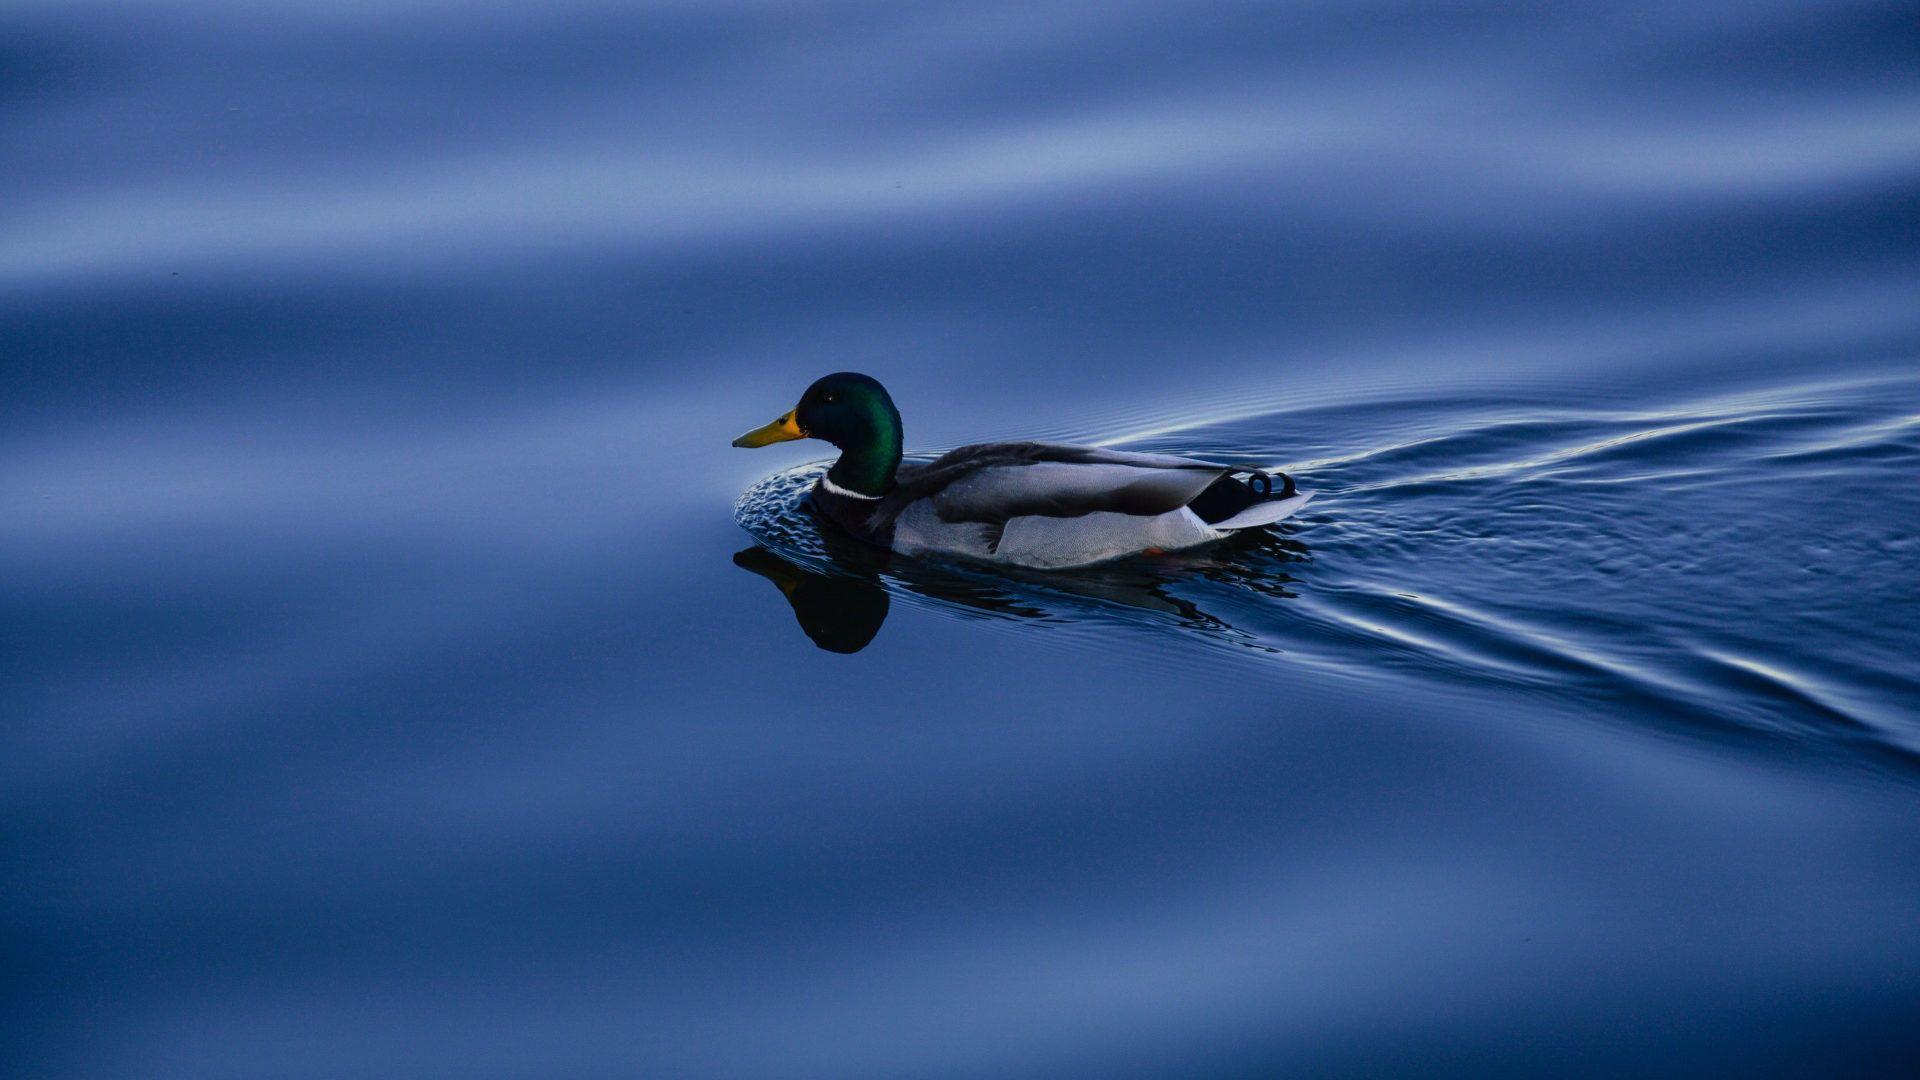 Duck Photo Hd